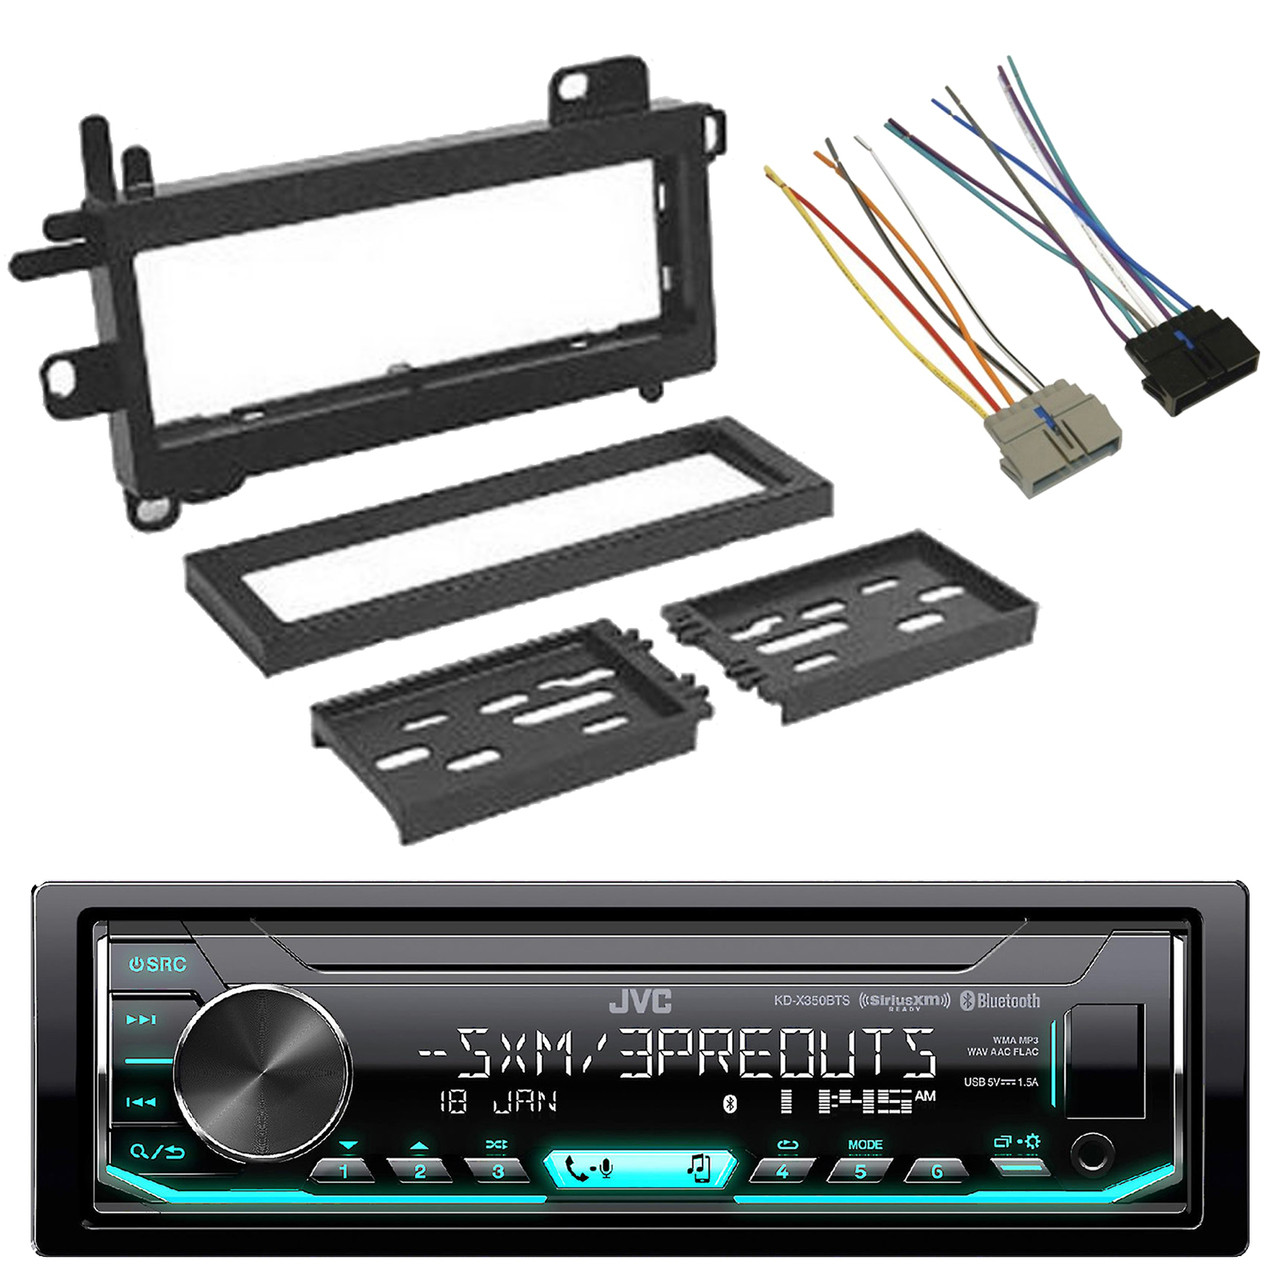 small resolution of  jvc usb aux siriusxm ready bluetooth car radio scosche wire harness scosche wiring harness